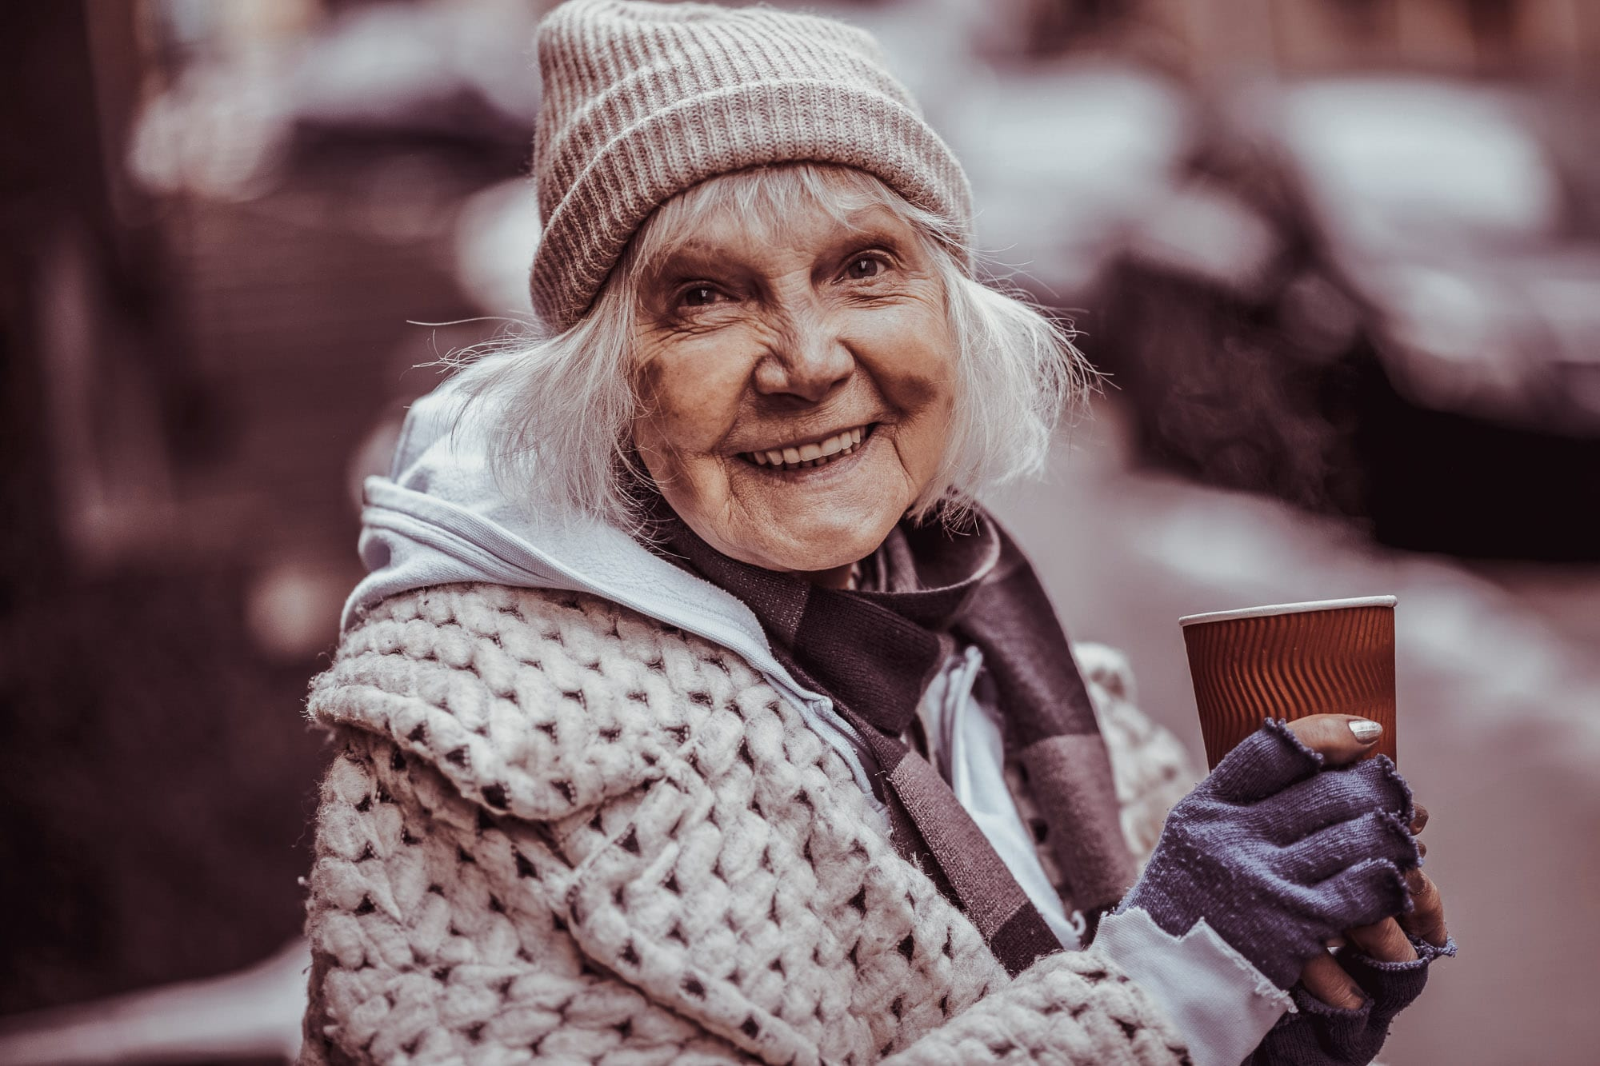 Benefits of employing homeless people